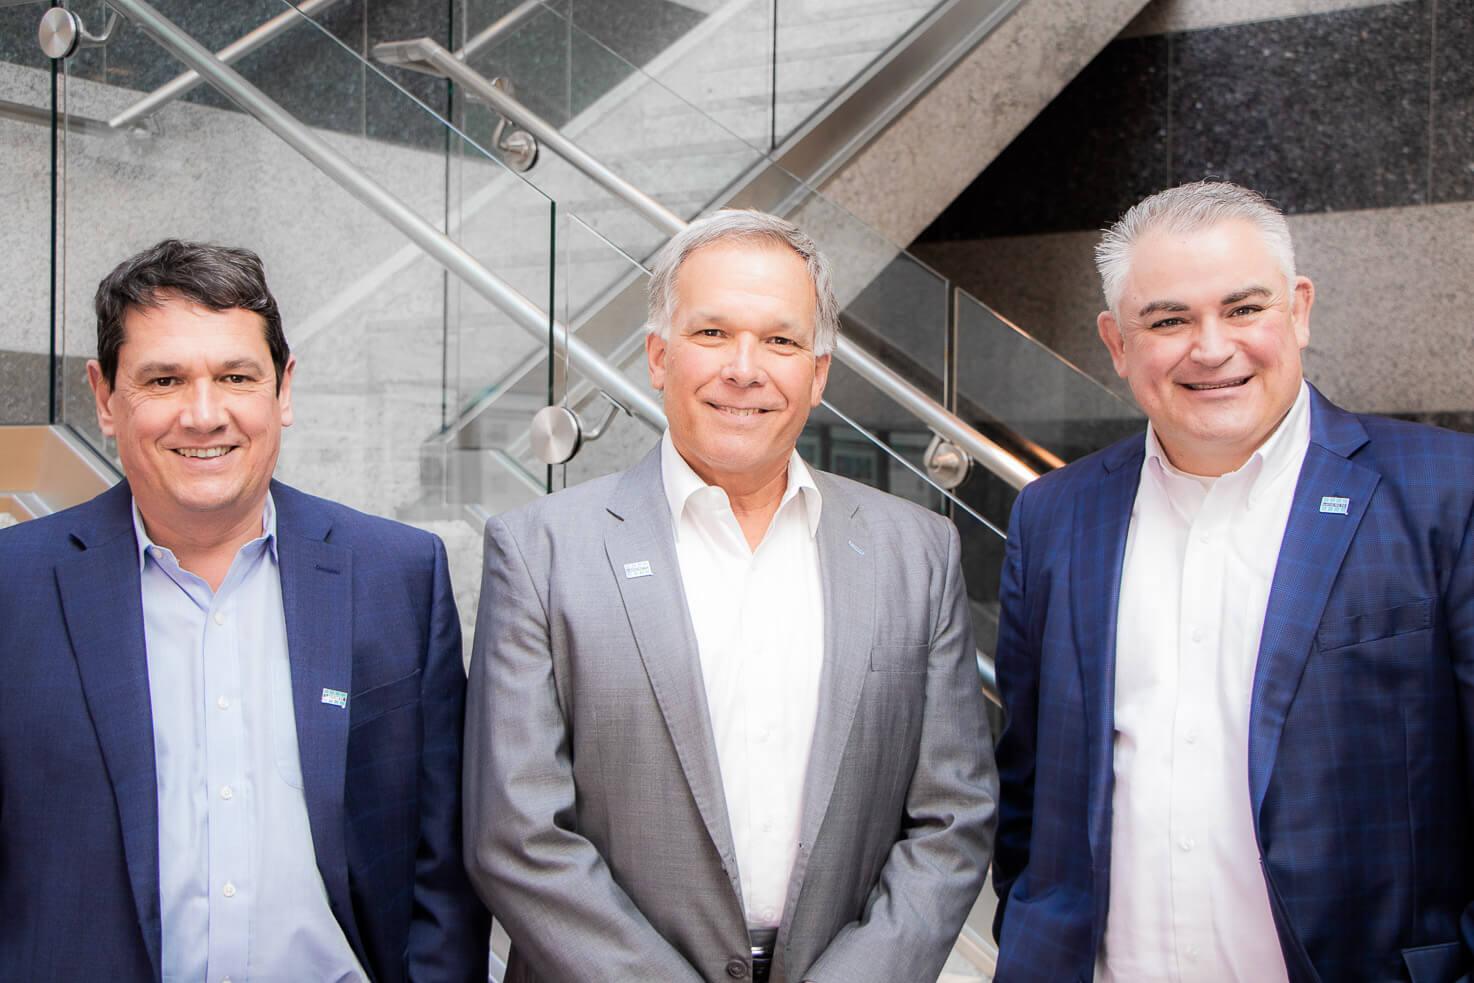 Patrick Millot, CEO LATICRETE with Ed Metcalf, President LATICRETE North America and Ron Nash, Senior Vice President of Sales and Marketing North America